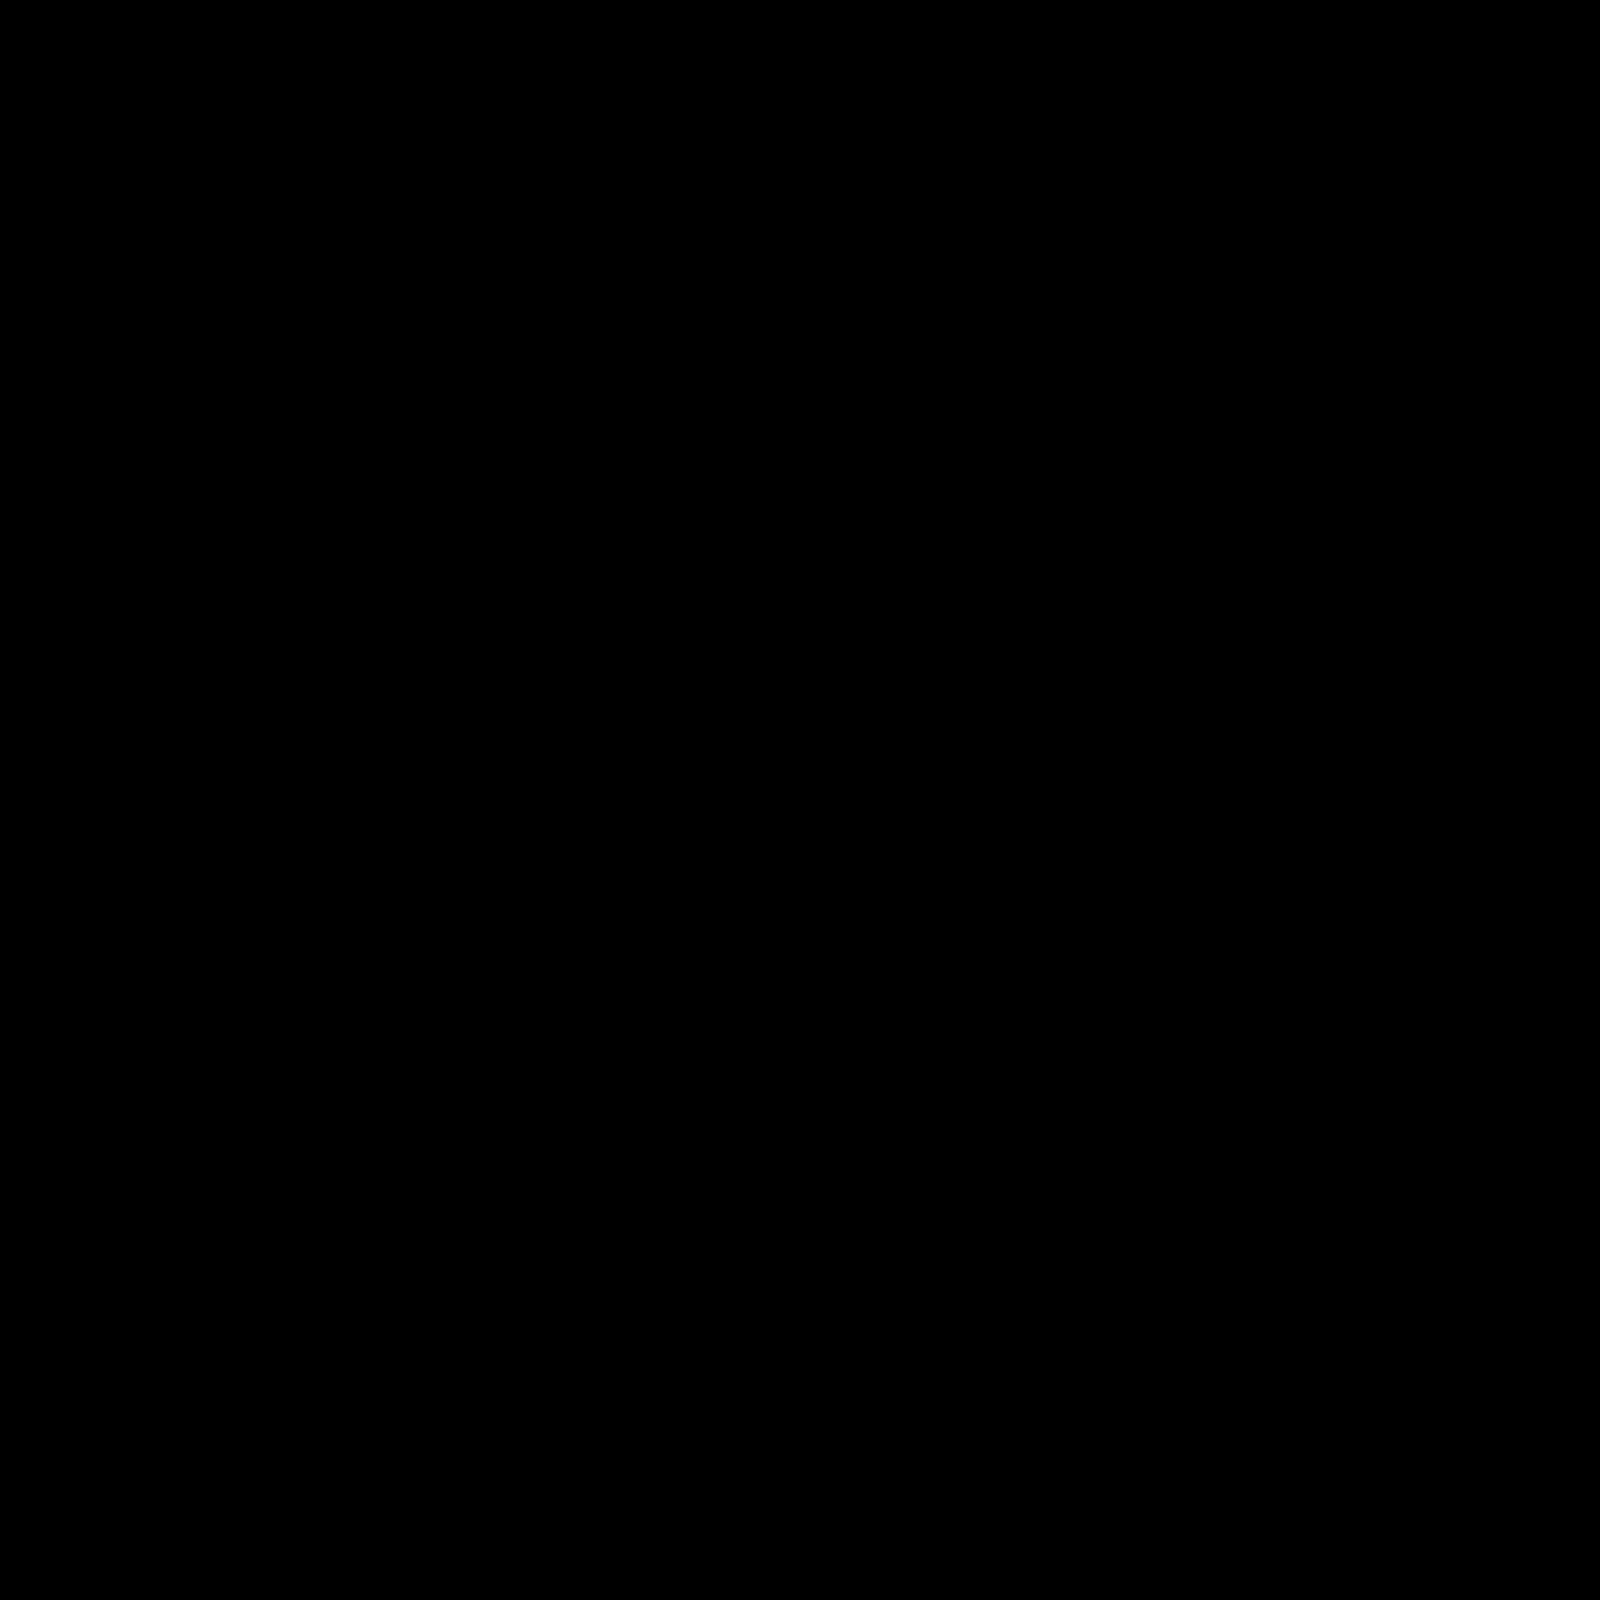 RPG icon